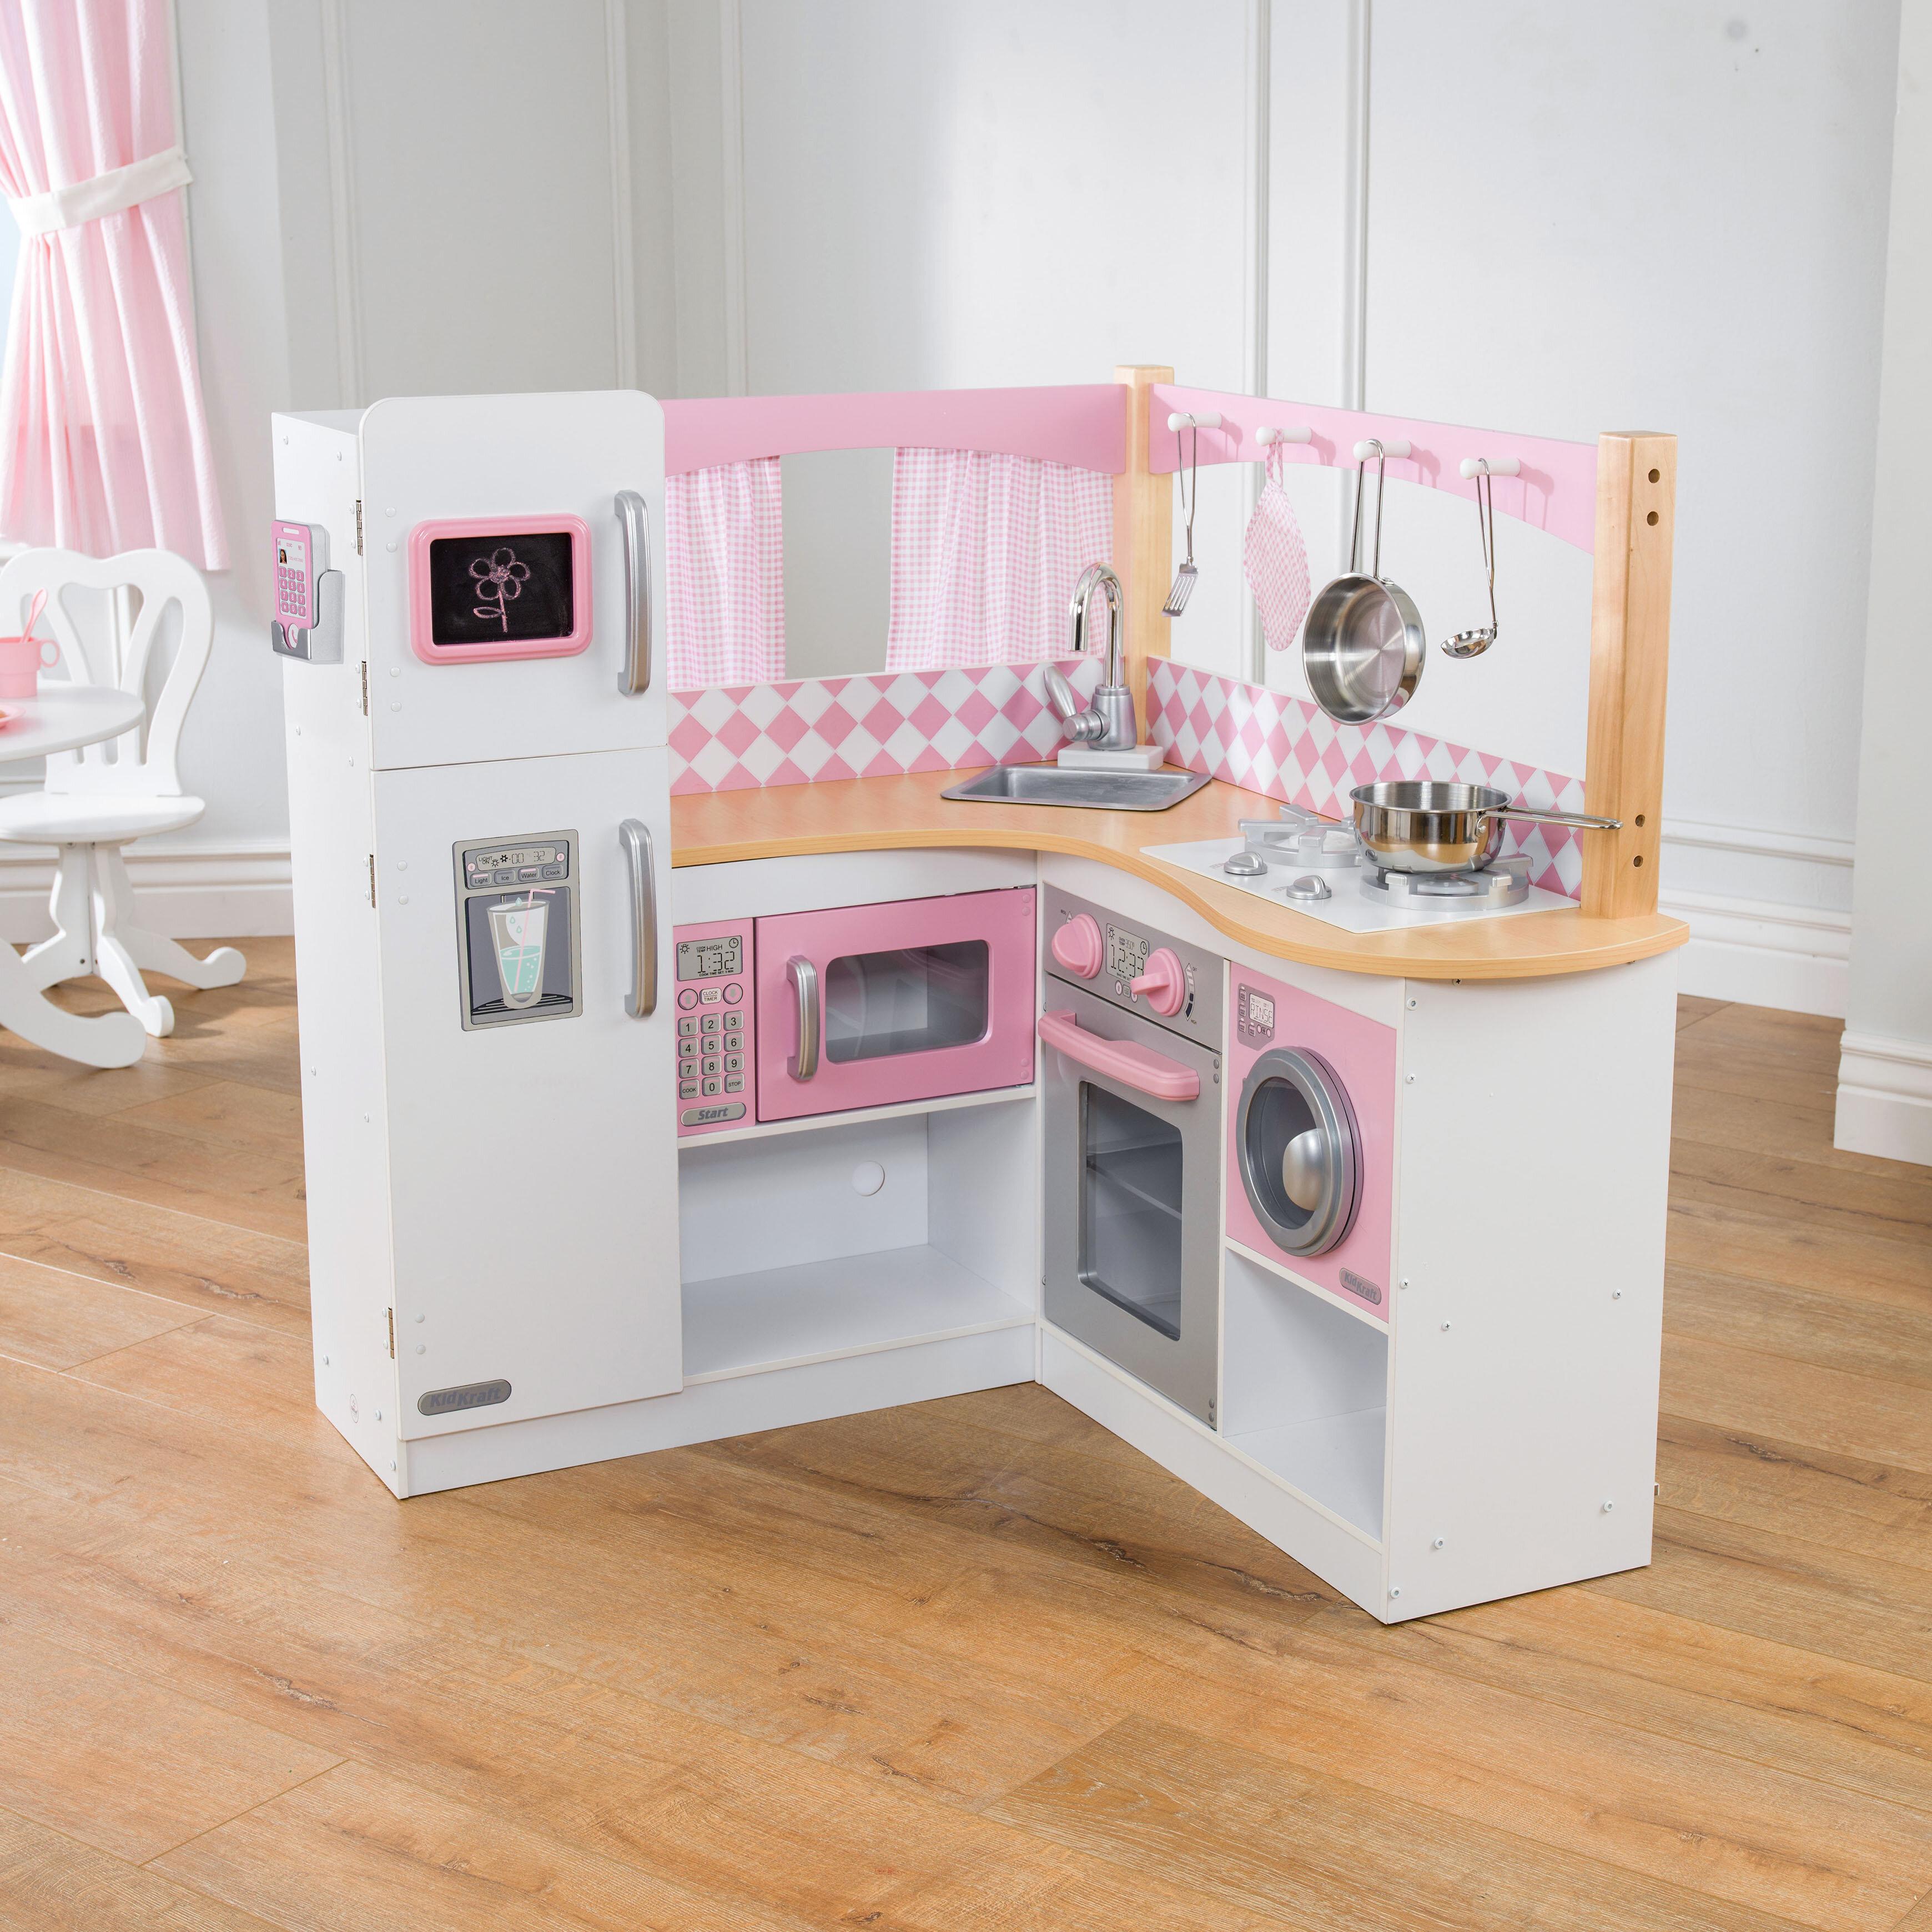 & KidKraft Grand Gourmet Corner Kitchen Set u0026 Reviews | Wayfair